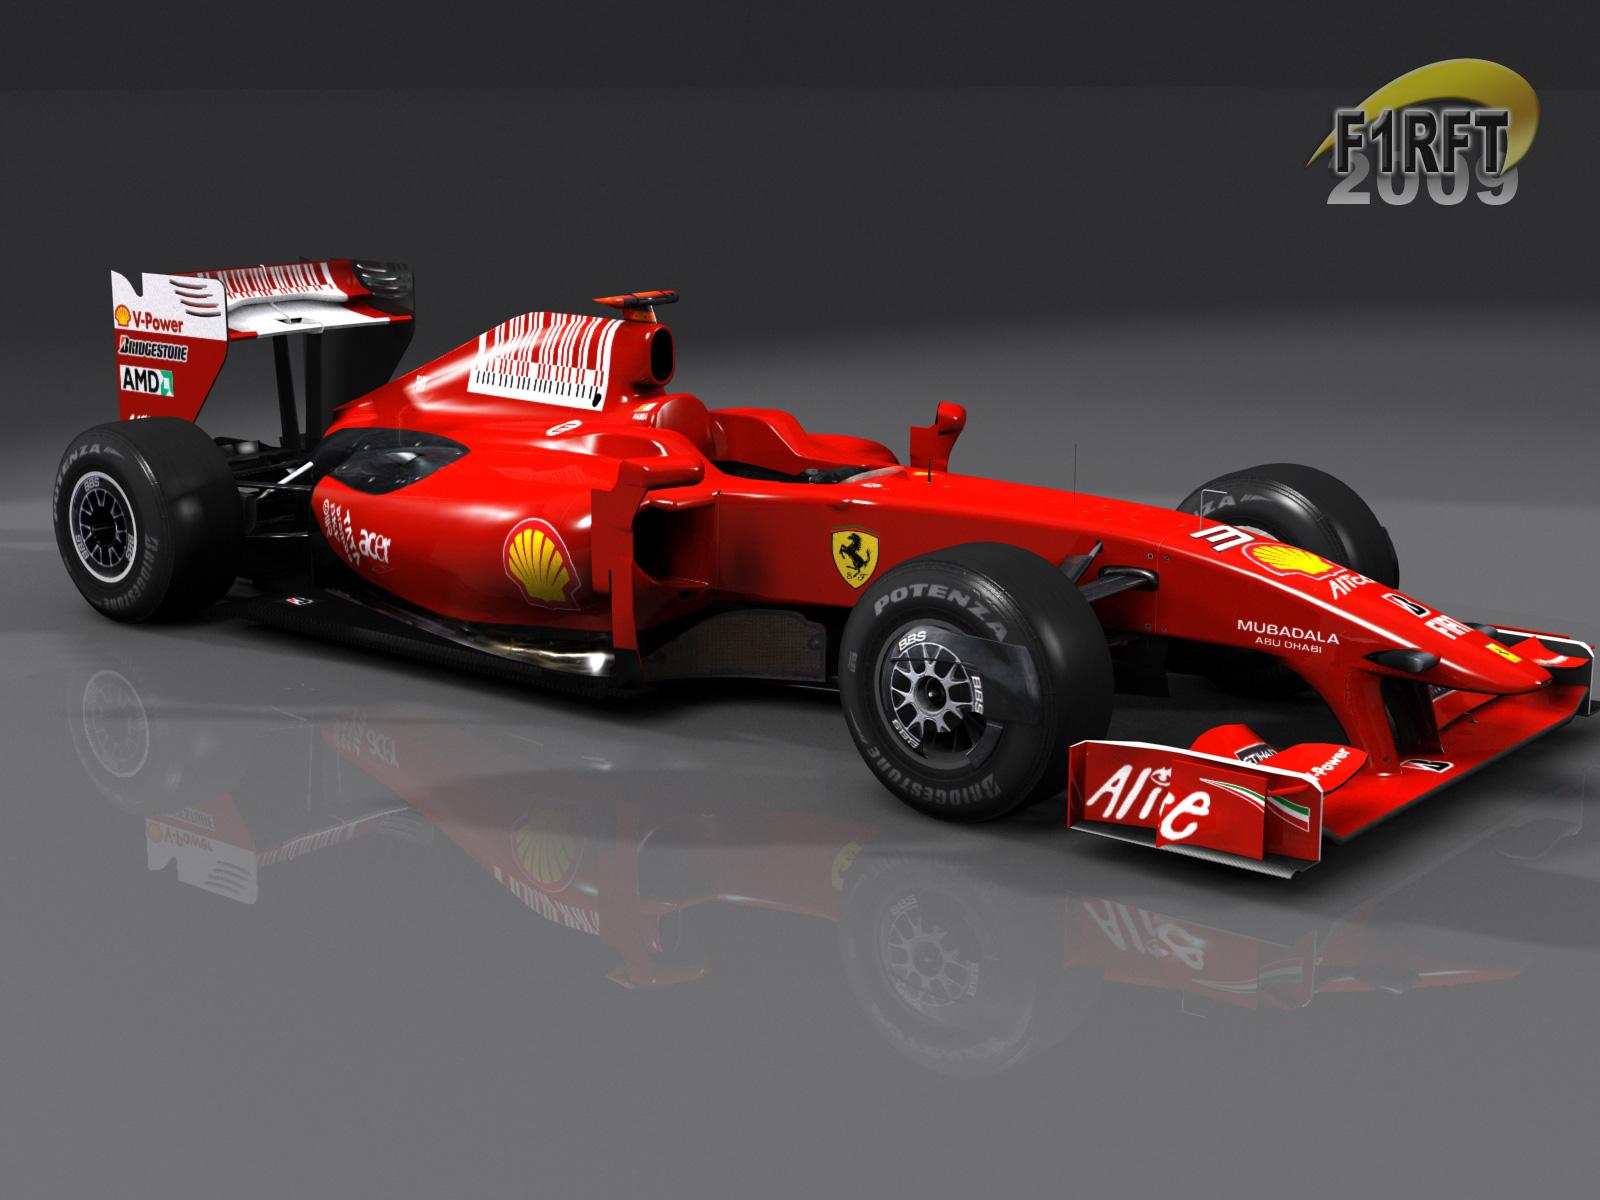 Ferrari F1 Photos Reviews News Specs Buy Car